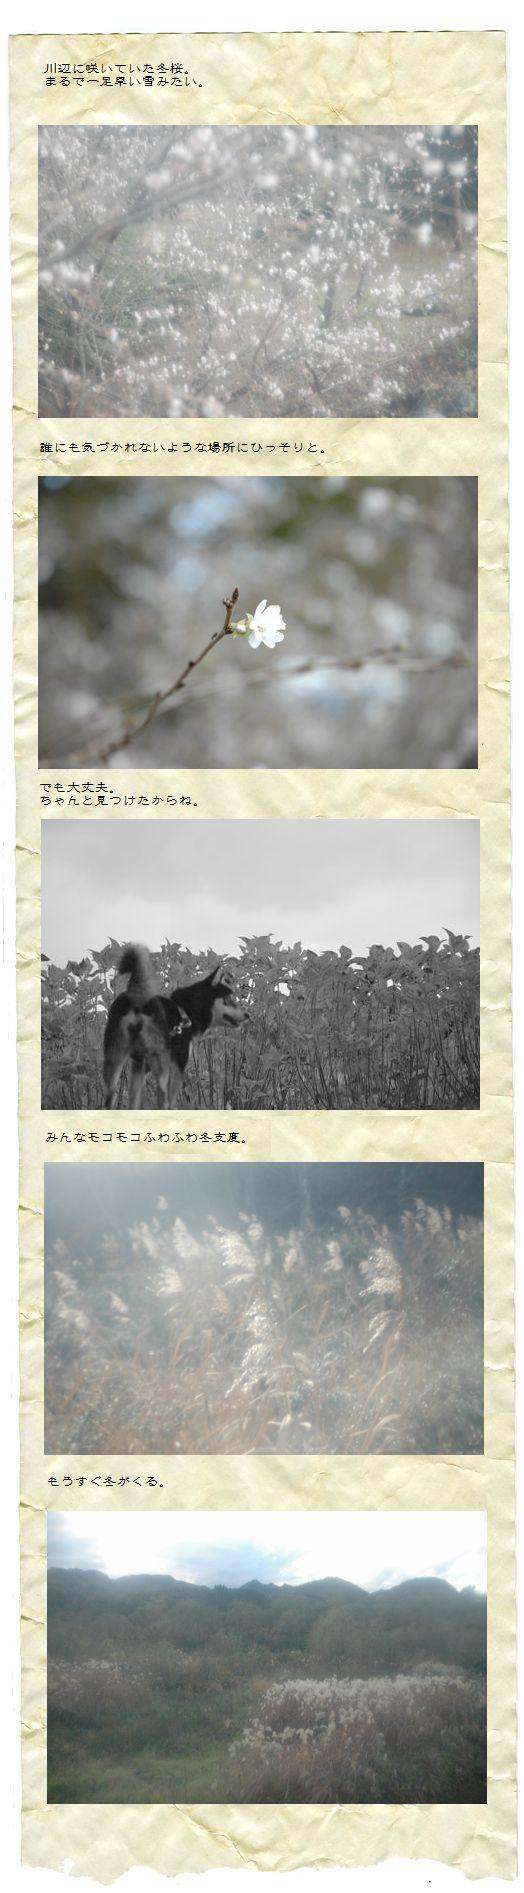 fuyujitaku.jpg